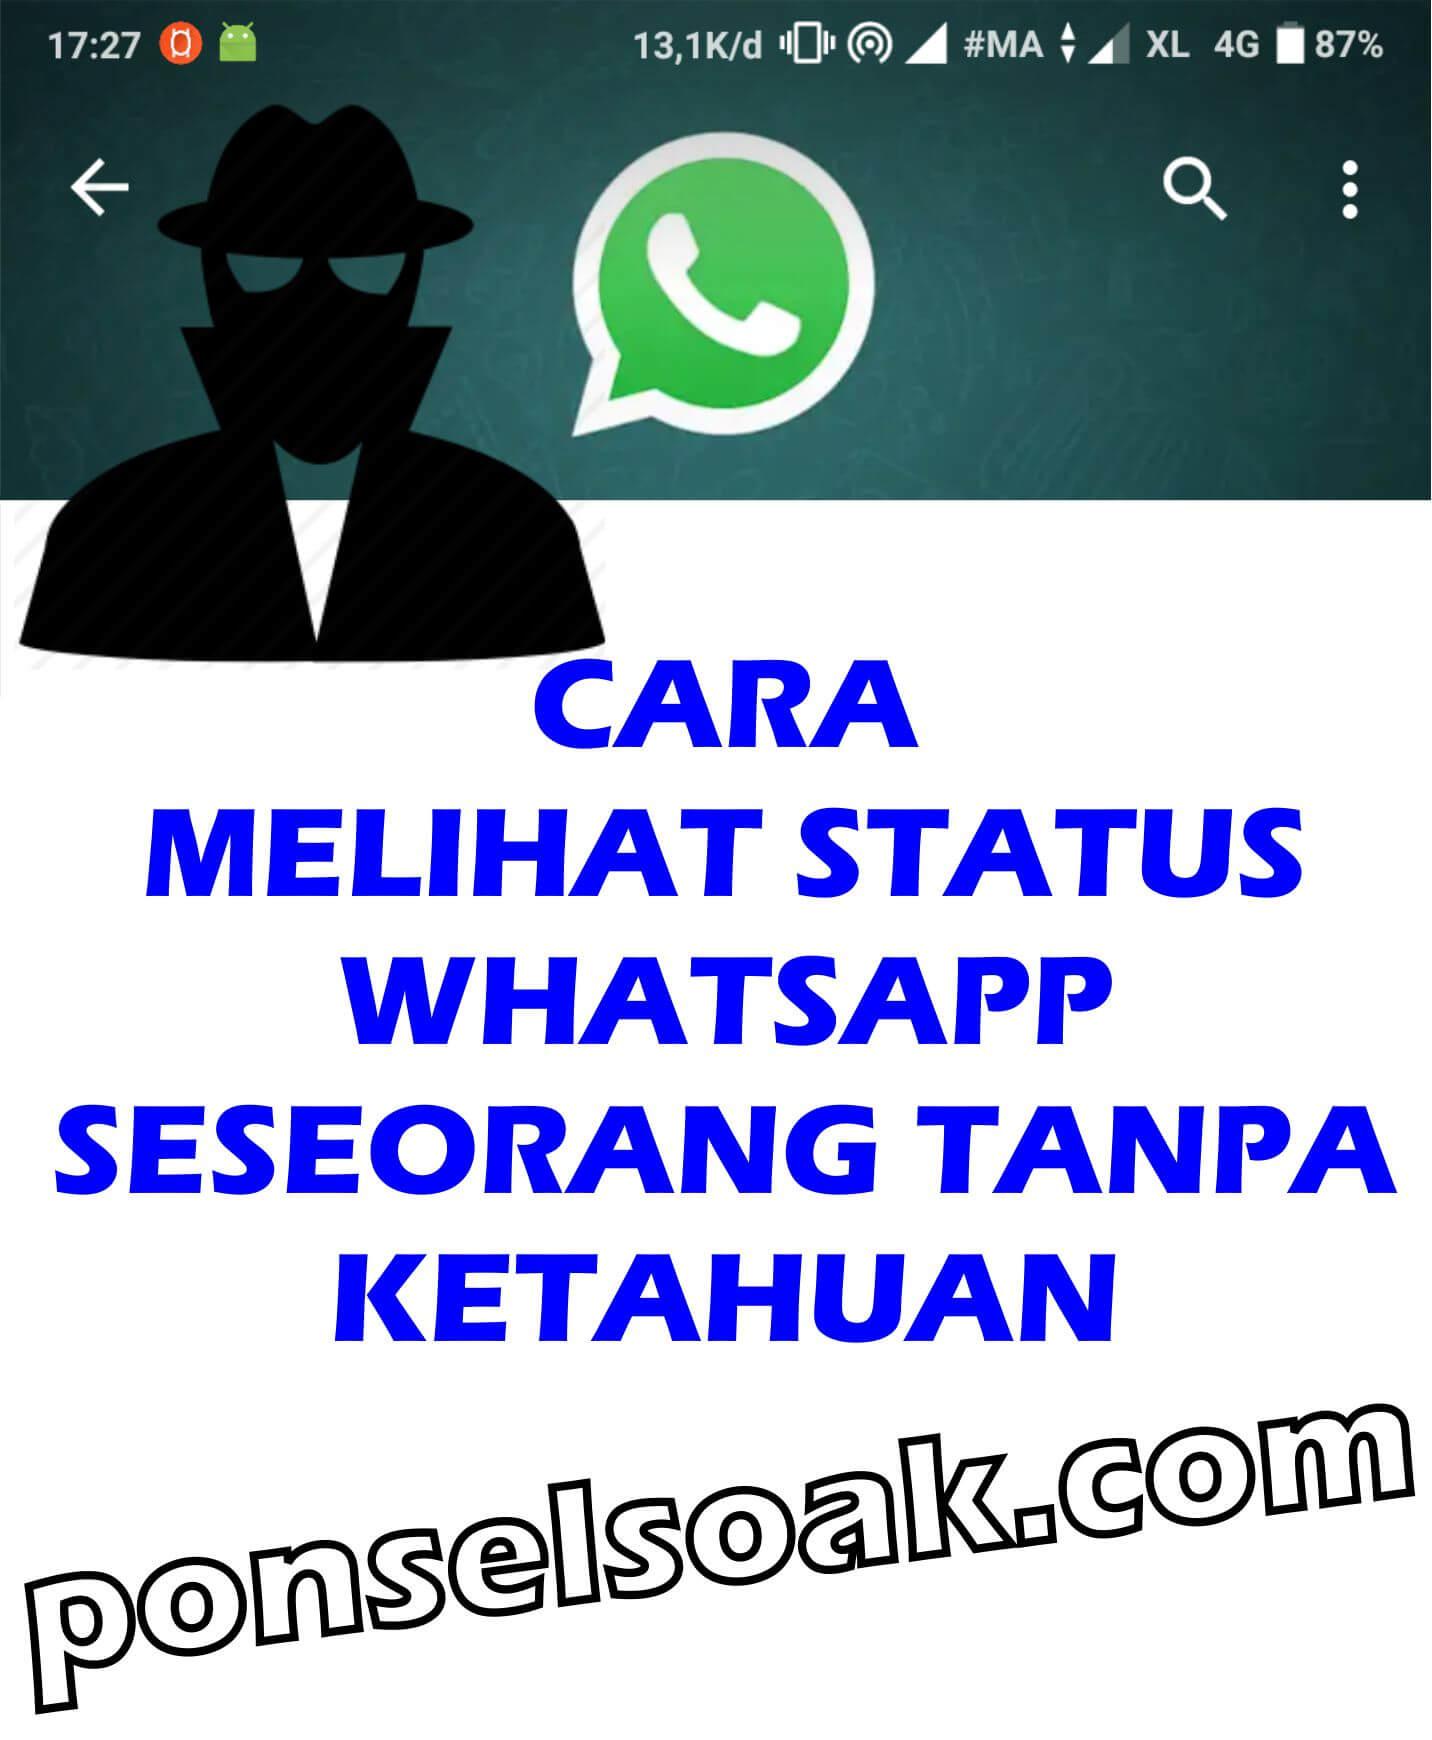 3+ Cara Melihat Status WhatsApp Seseorang Tanpa Ketahuan